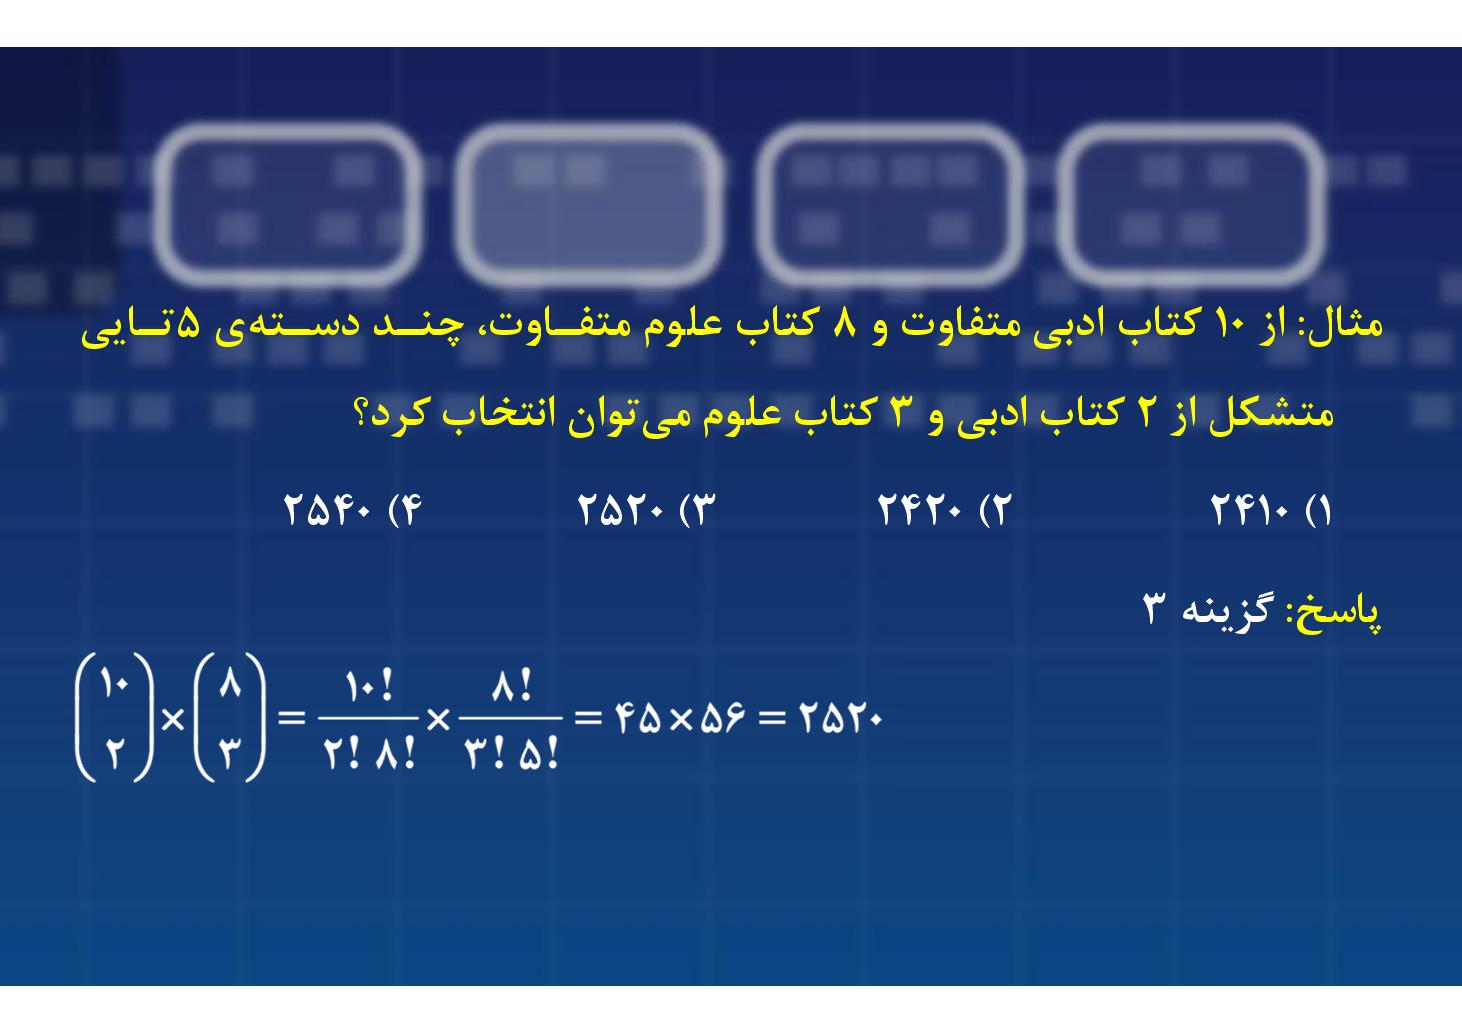 ریاضی سوم- فصل ٣- ترکیب- بخش ۴ (PDF)